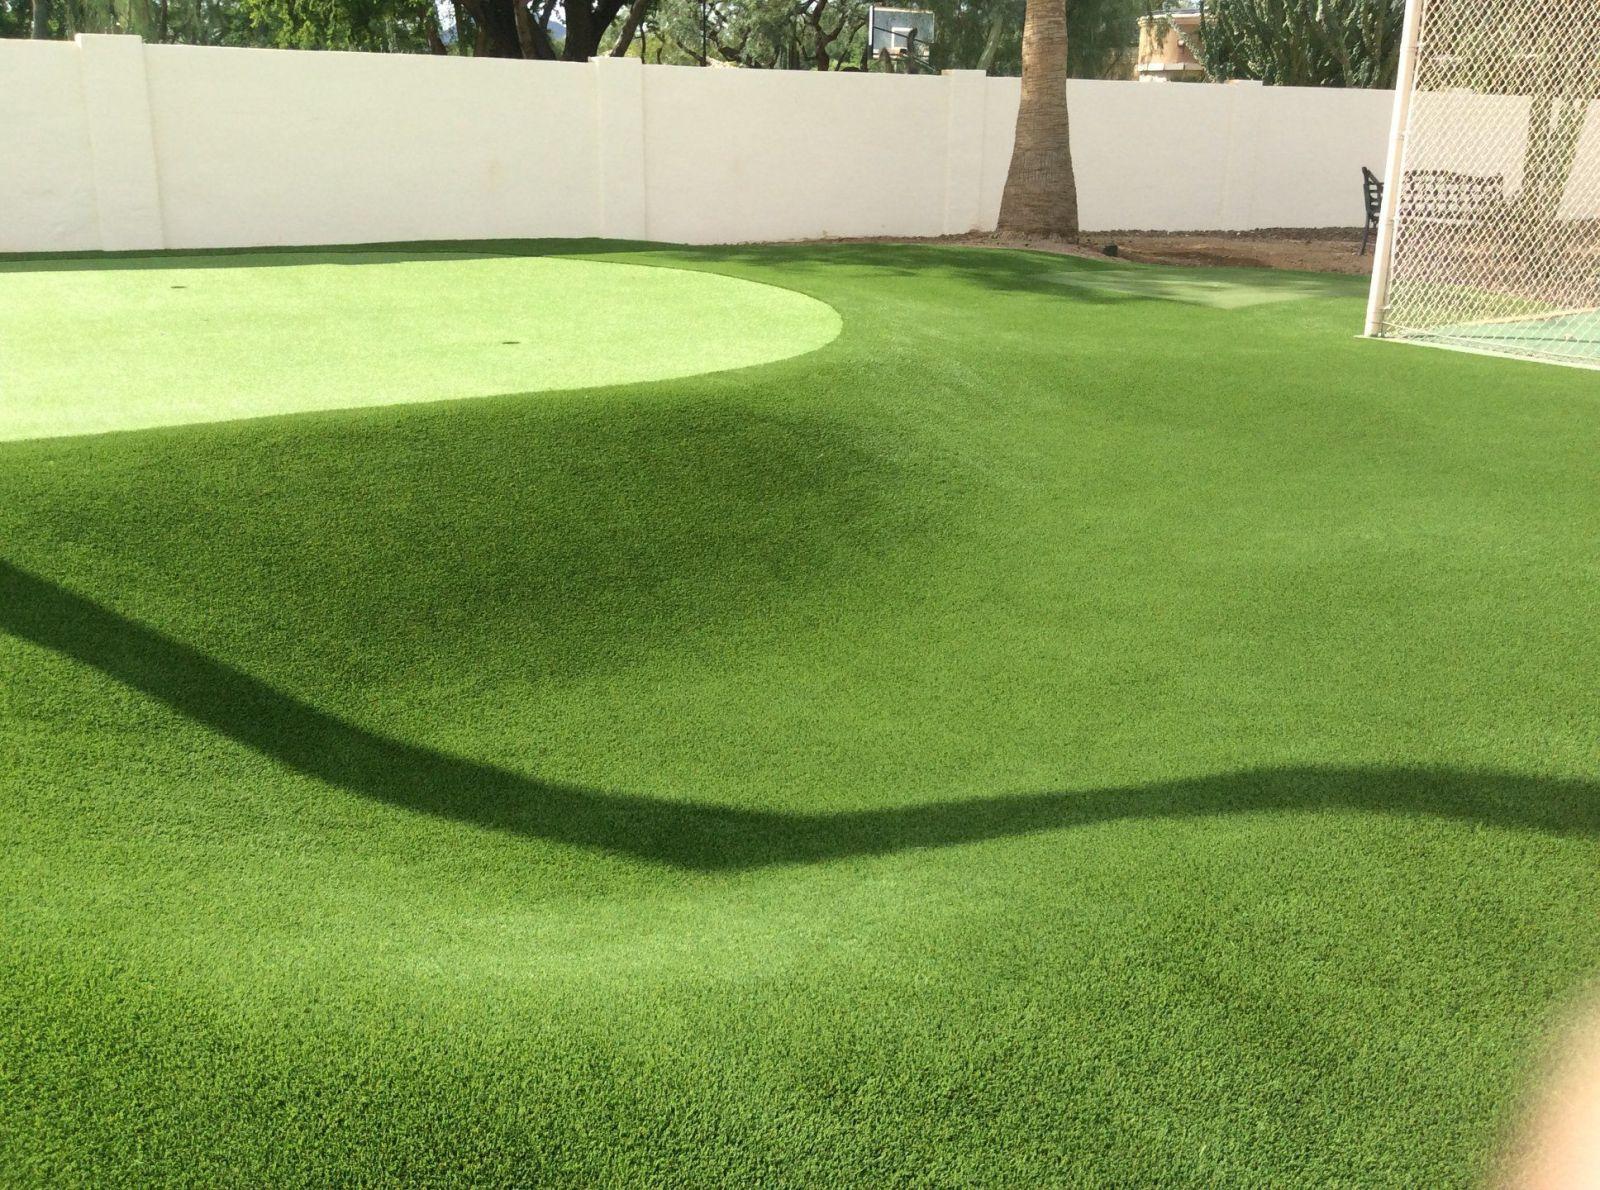 custom backyard putting green installers in Arizona